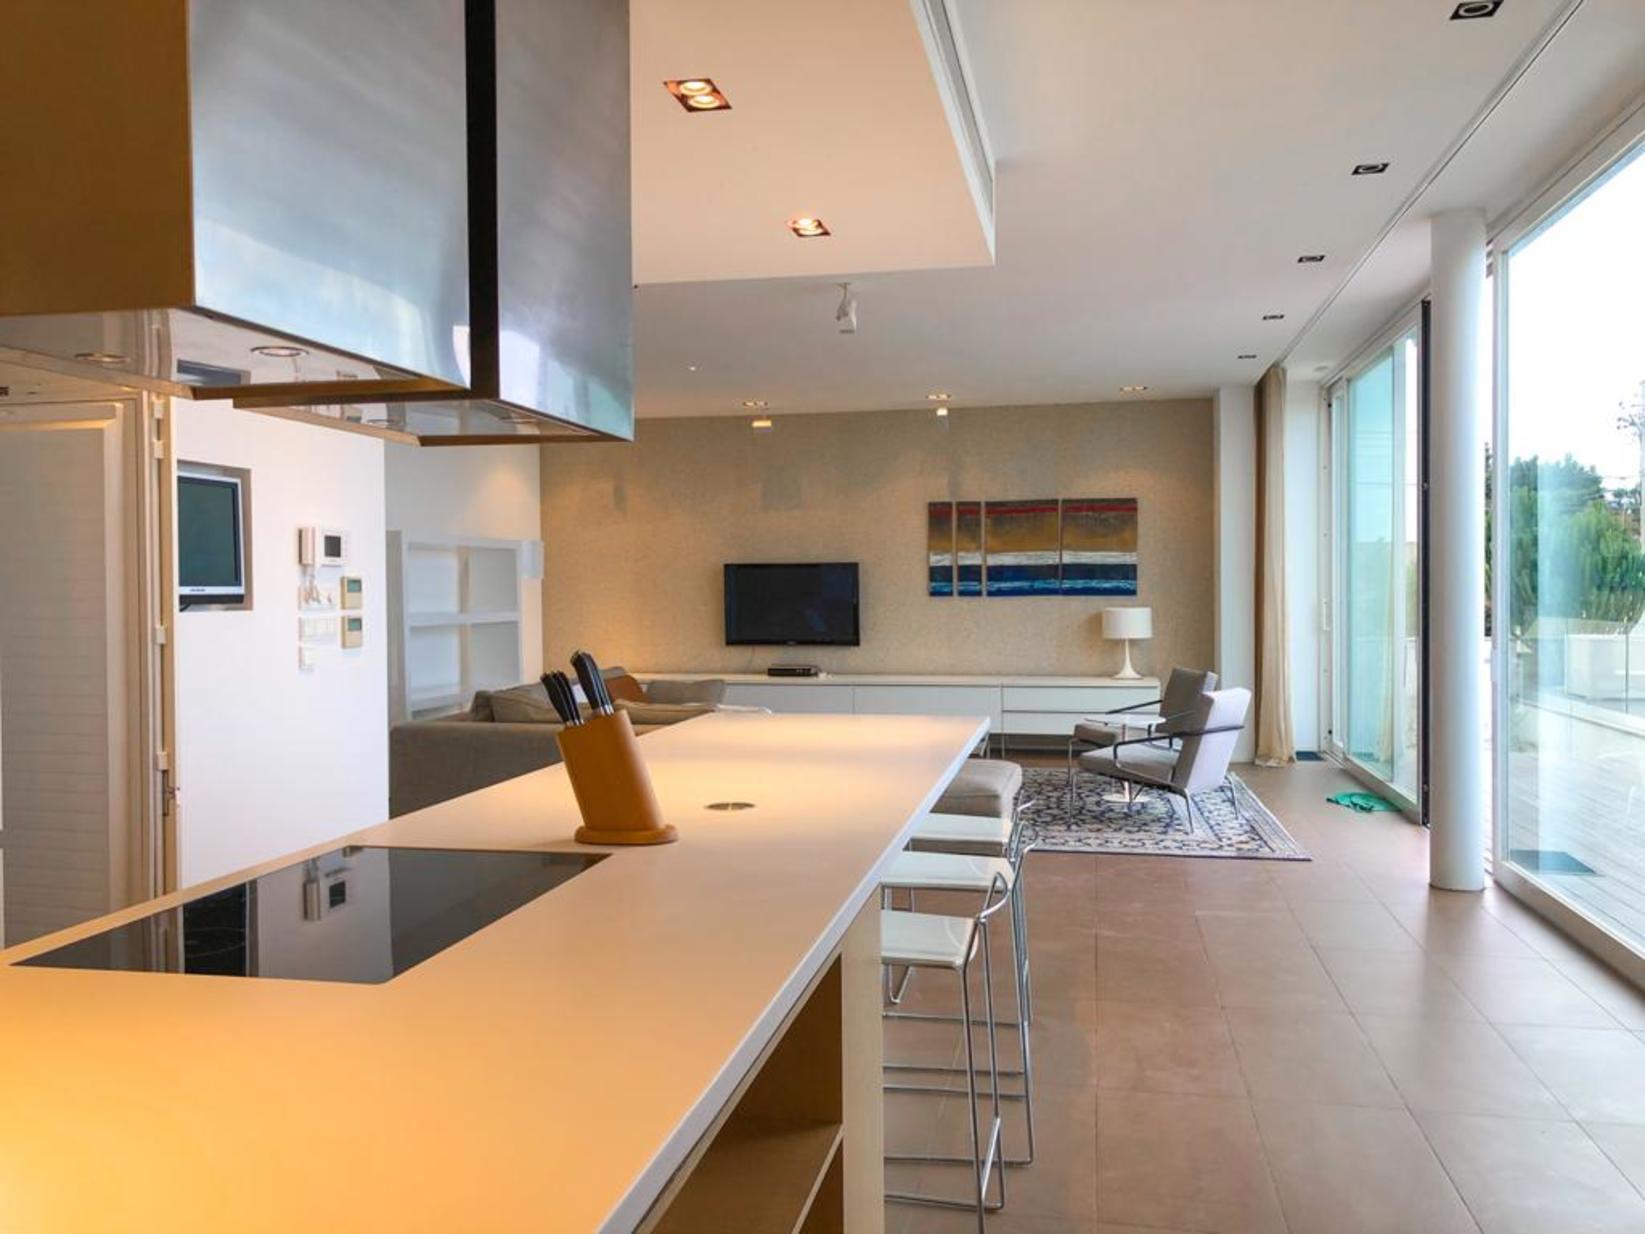 3 bed Villa For Rent in Bahar ic-Caghaq, Bahar ic-Caghaq - thumb 11